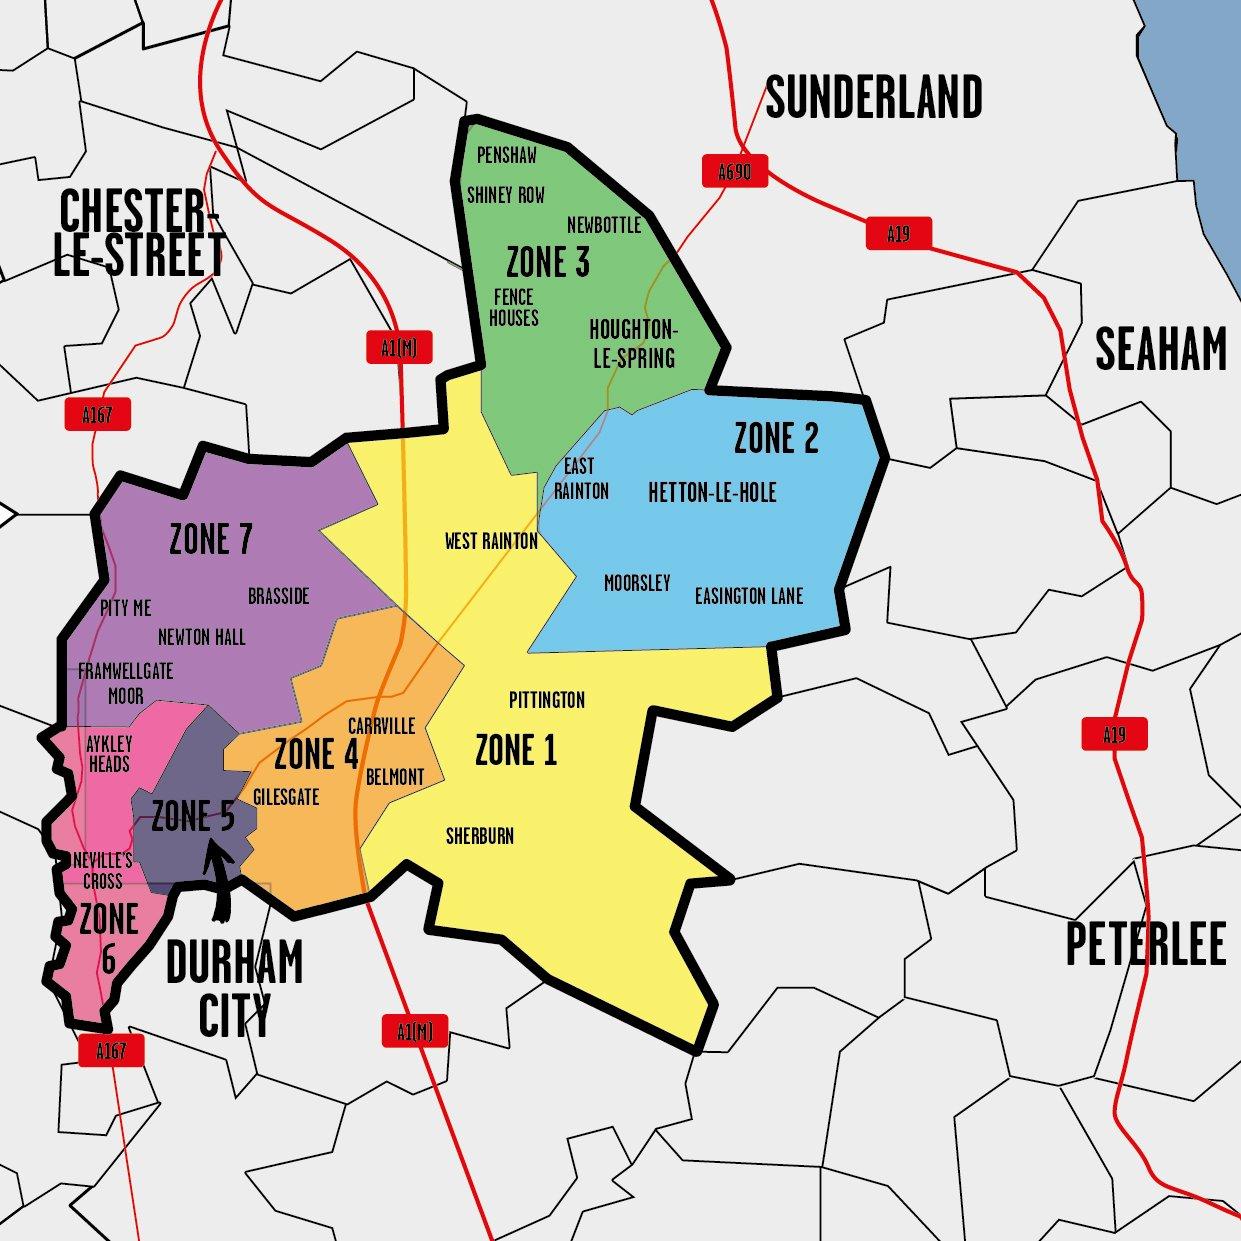 NE-DURHAM-REGIONS-ZONE-MAP-A4-01